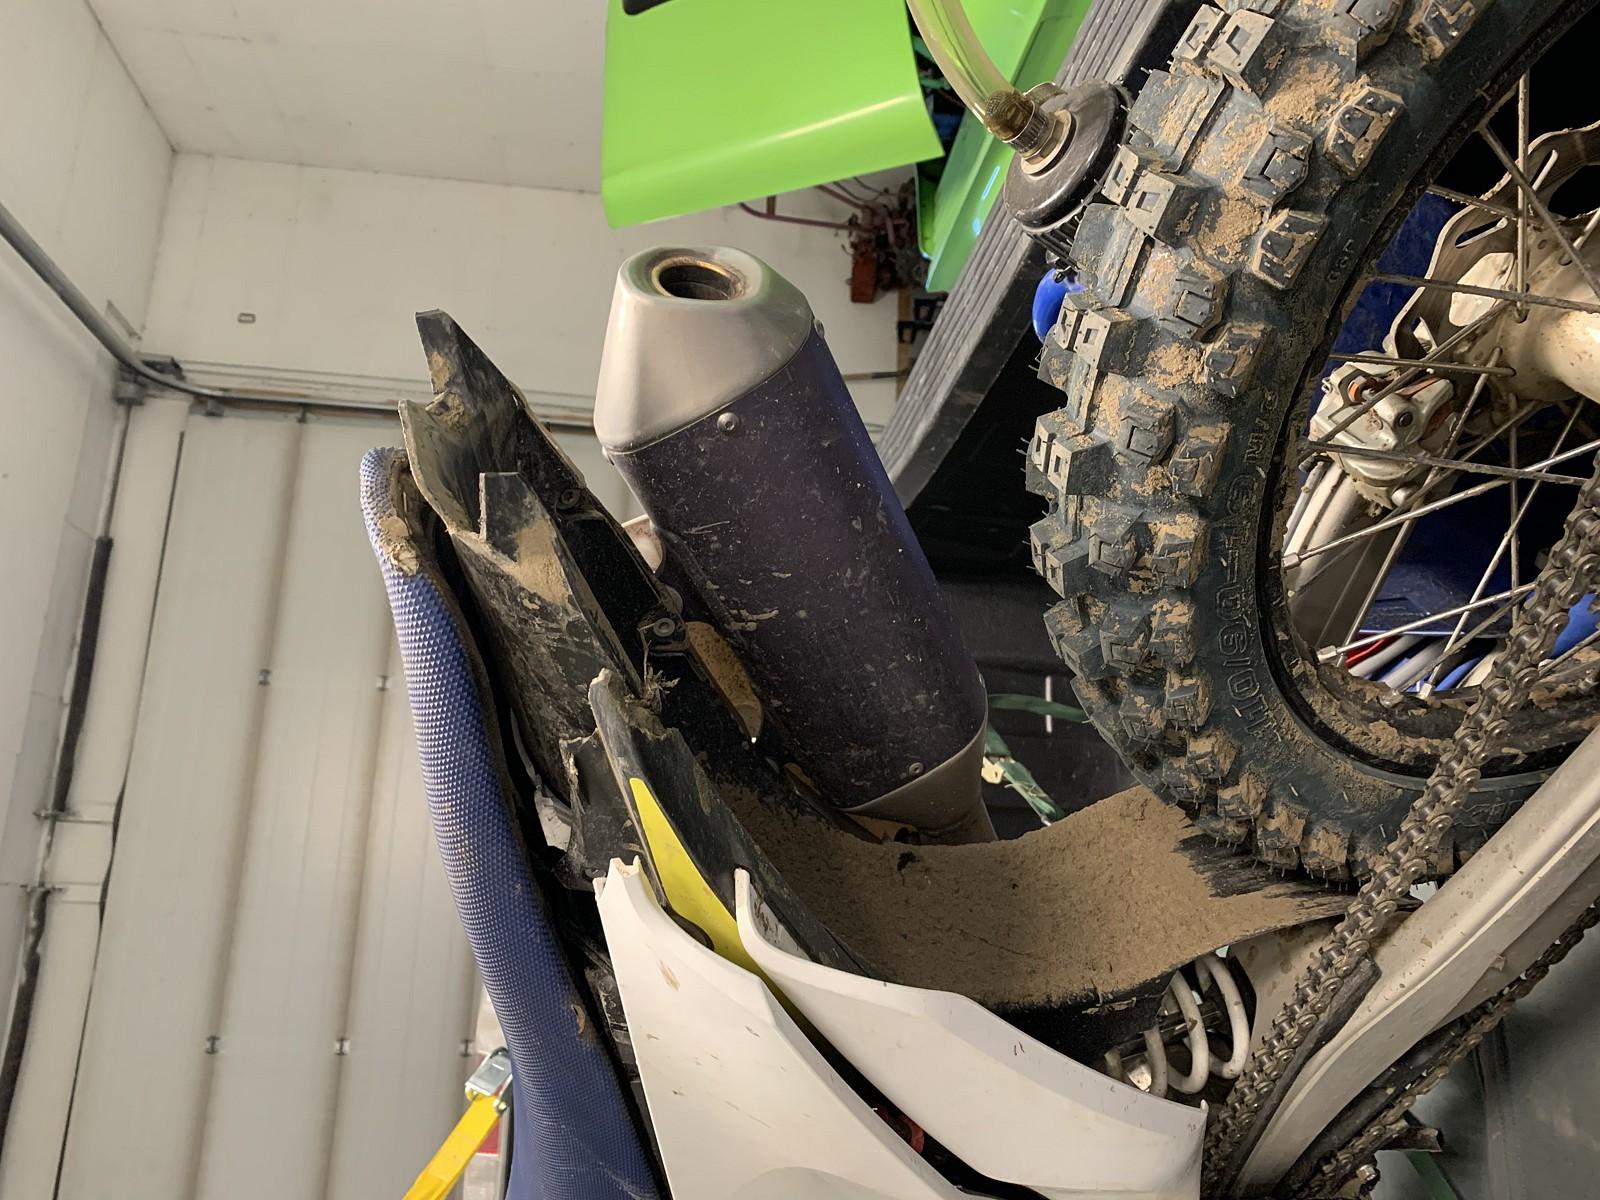 6653866F-EBA2-4224-99CF-37952C230C64 - whitechapel44 - Motocross Pictures - Vital MX